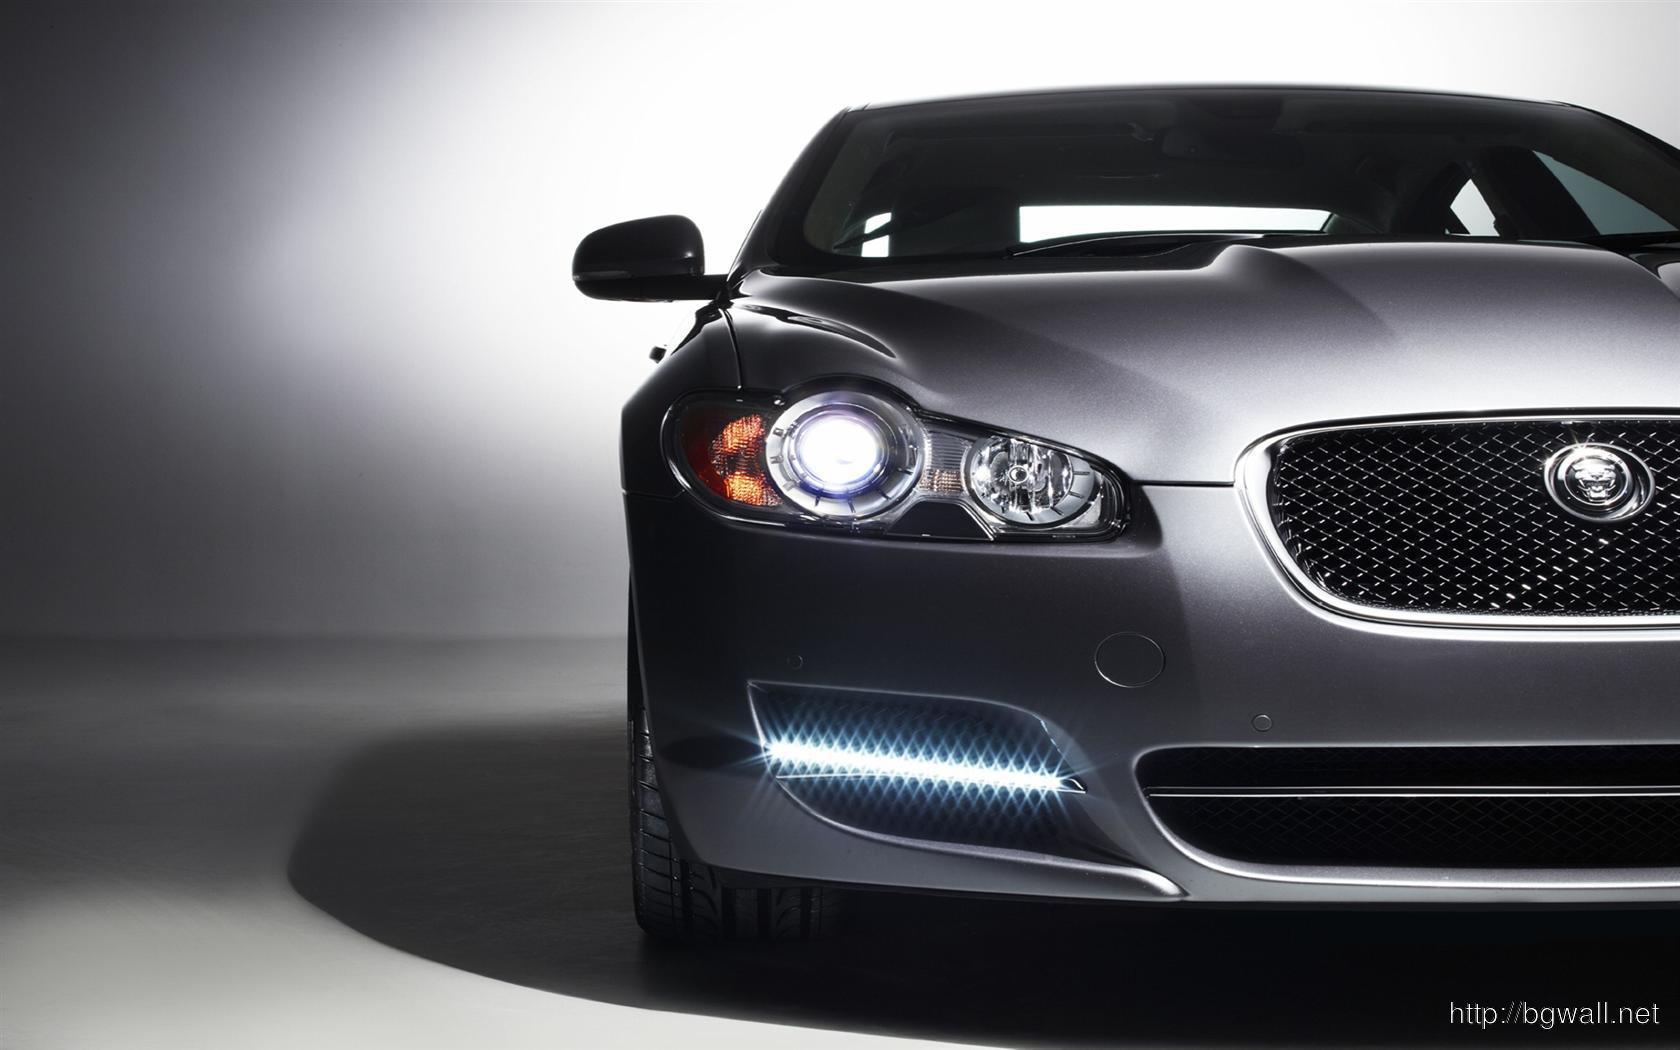 Jaguar-XF-Free-Downloads-Wallpaper